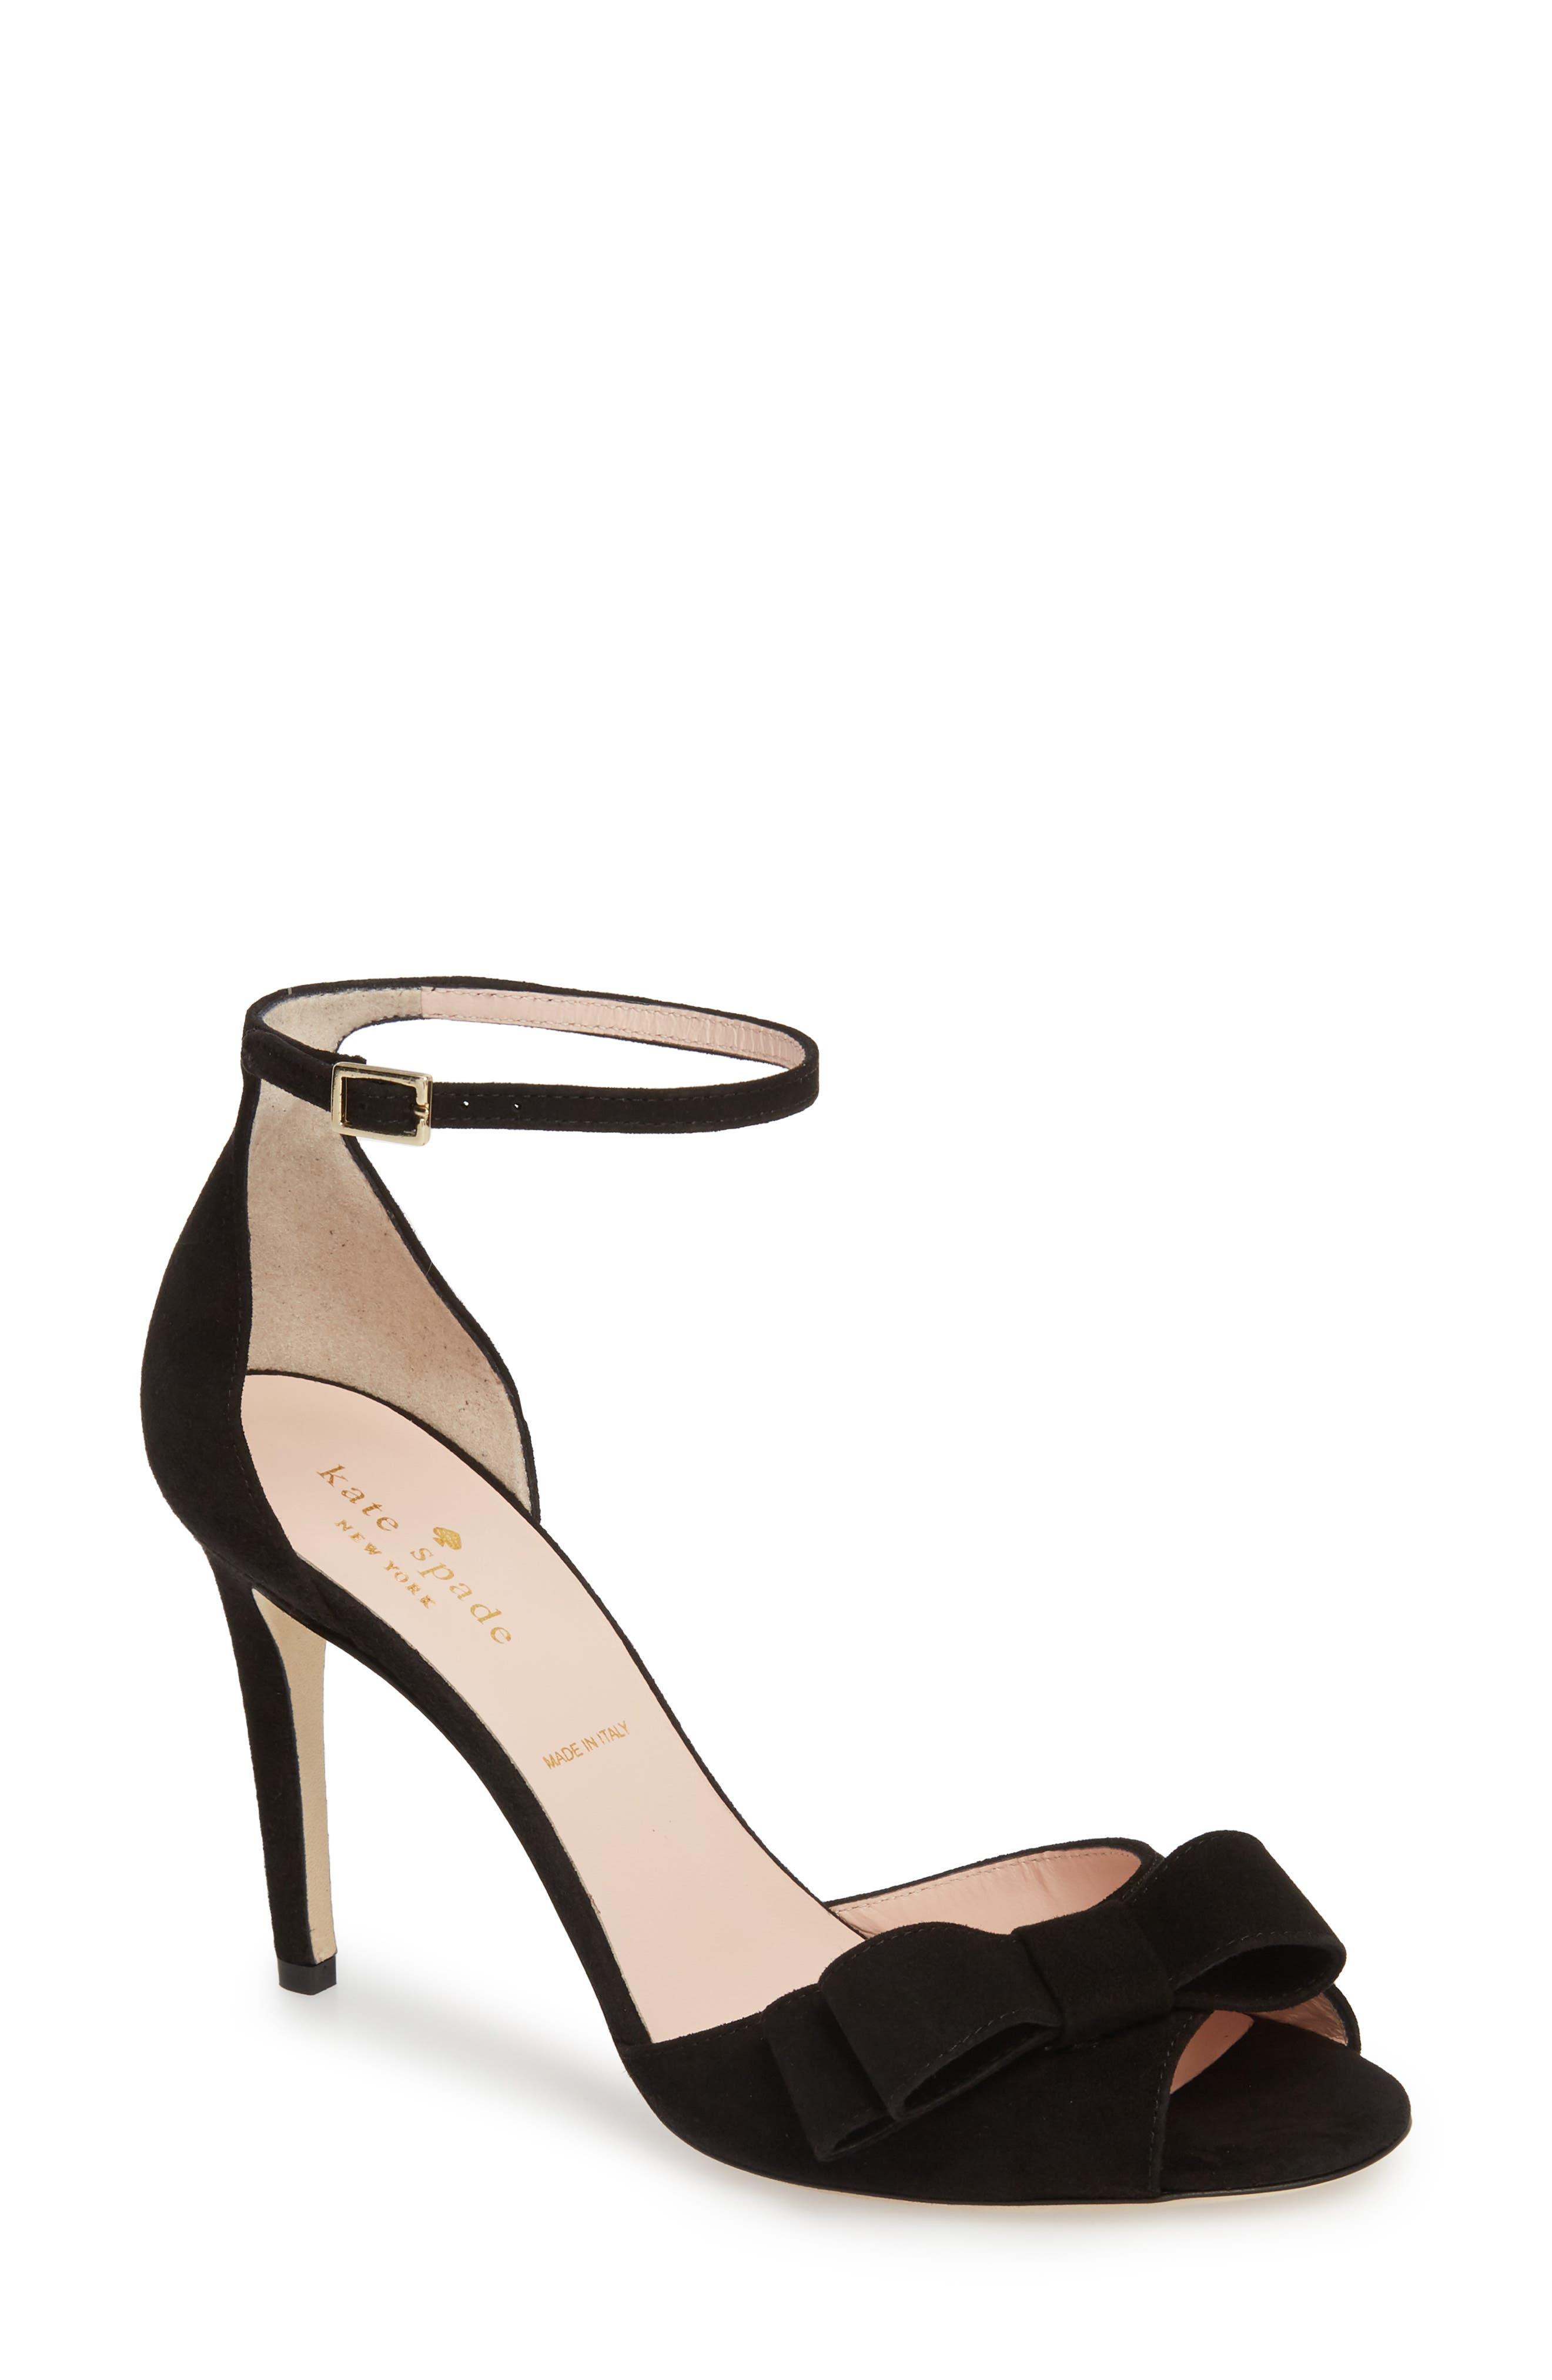 ismay ankle strap sandal,                             Main thumbnail 1, color,                             001